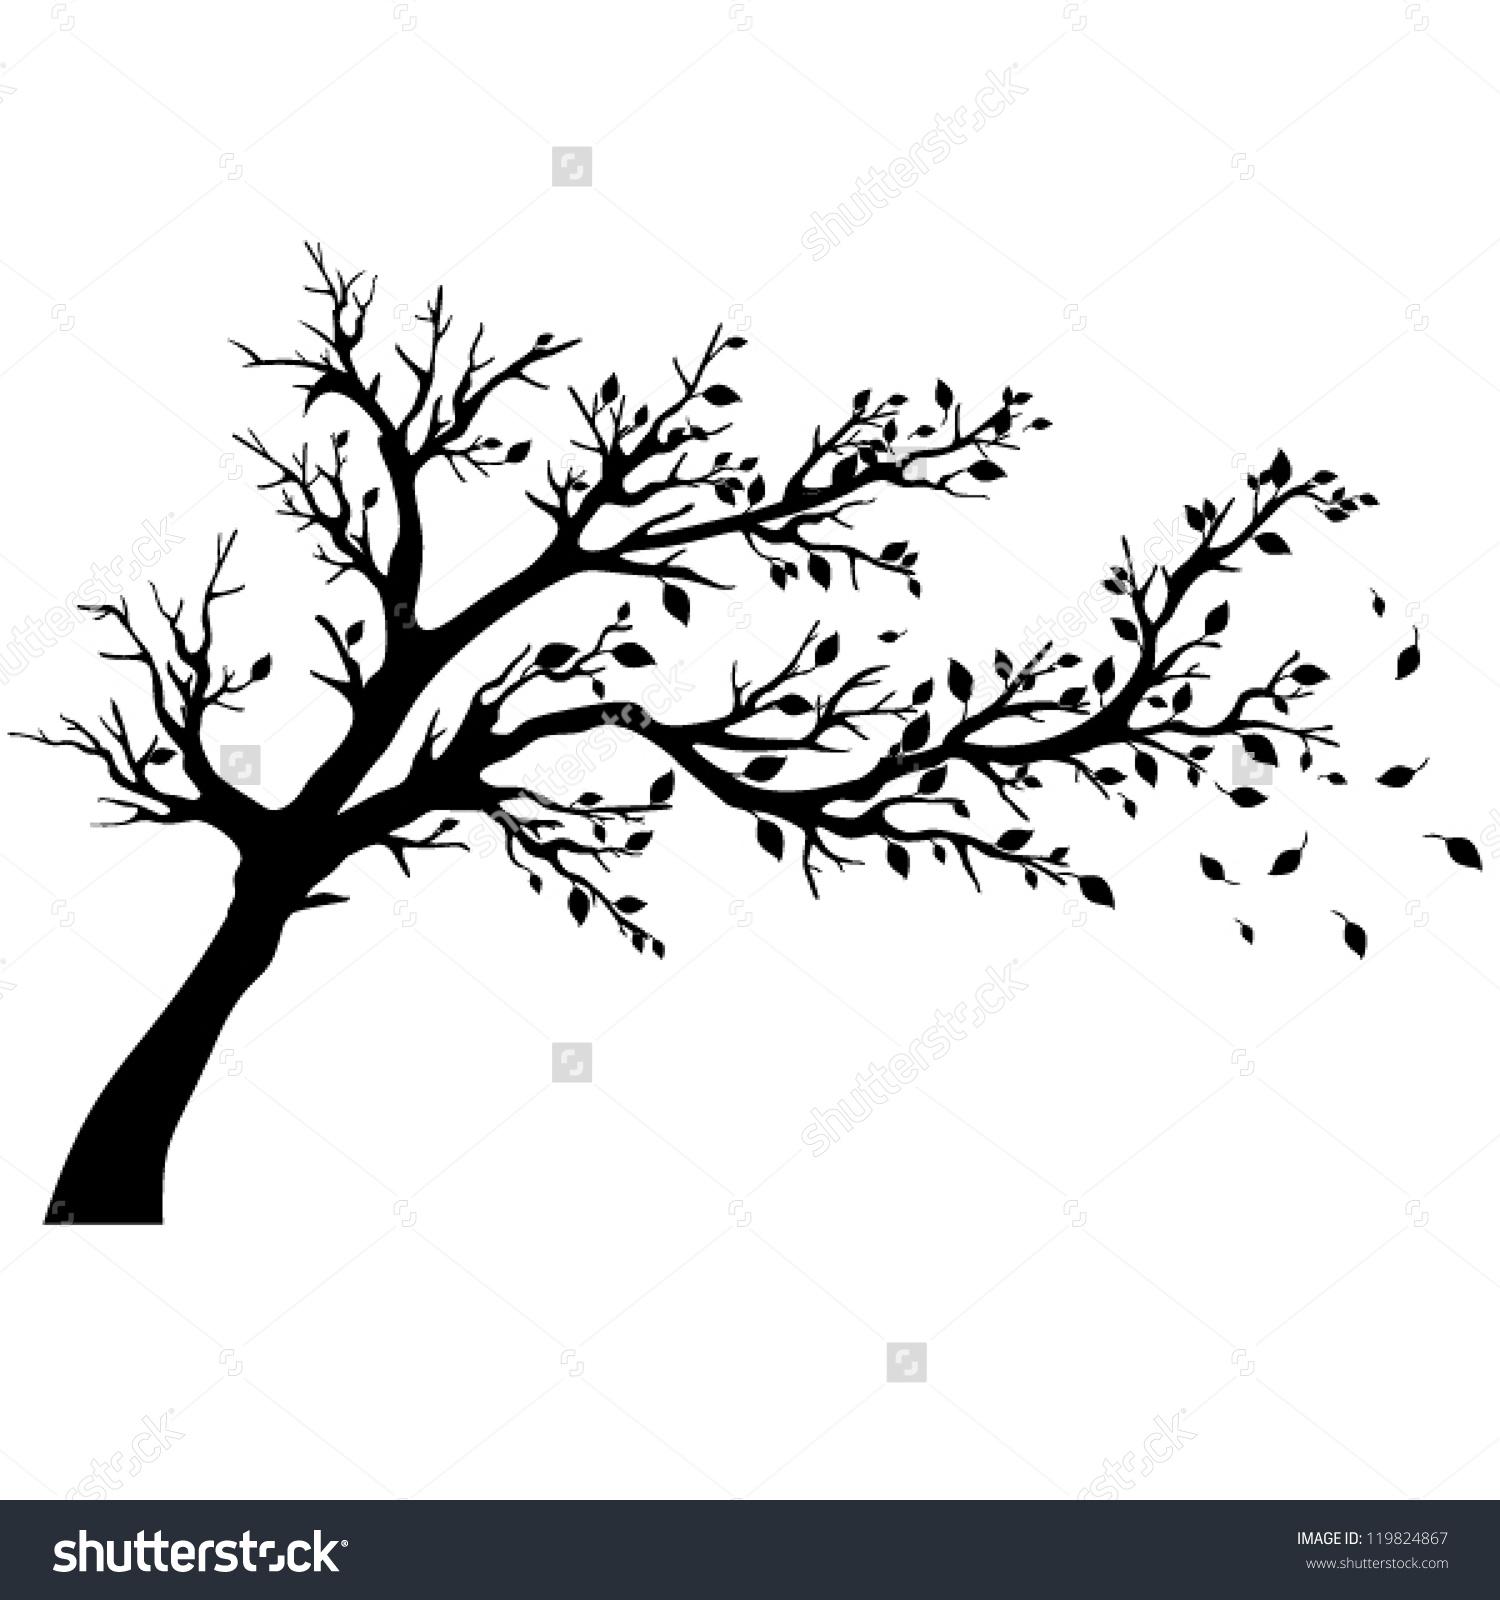 Tree Silhouettes Vector Illustration Stock Vector 119824867.